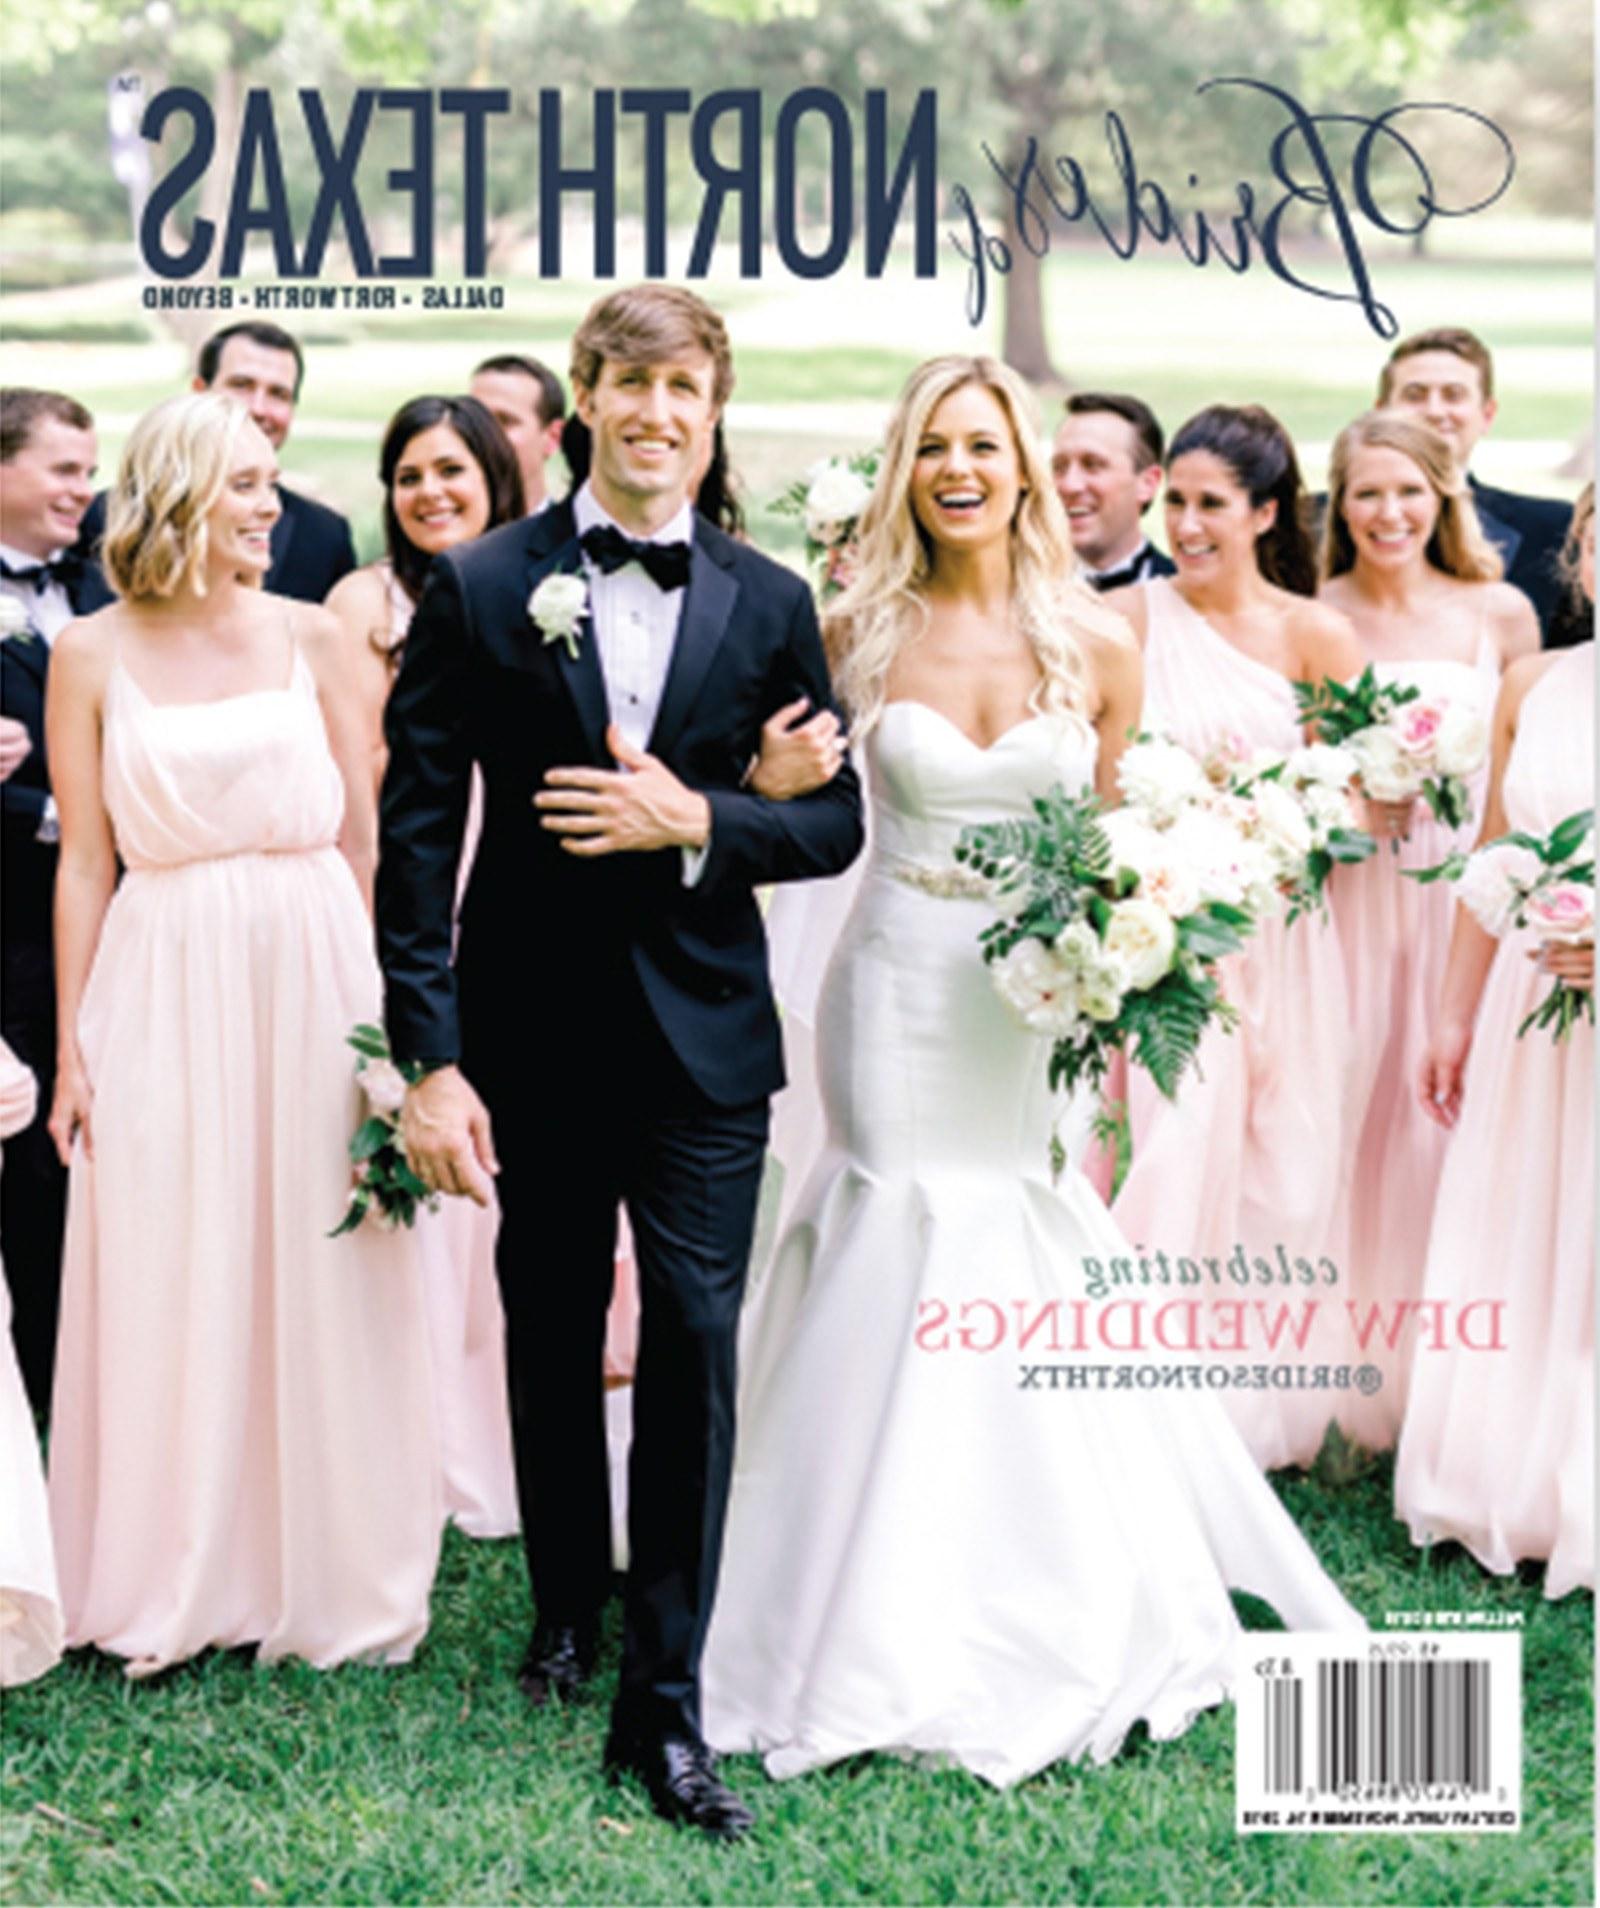 Design Gaun Pengantin Muslimah Warna Gold 0gdr Real Weddings Featured In Brides Of north Texas